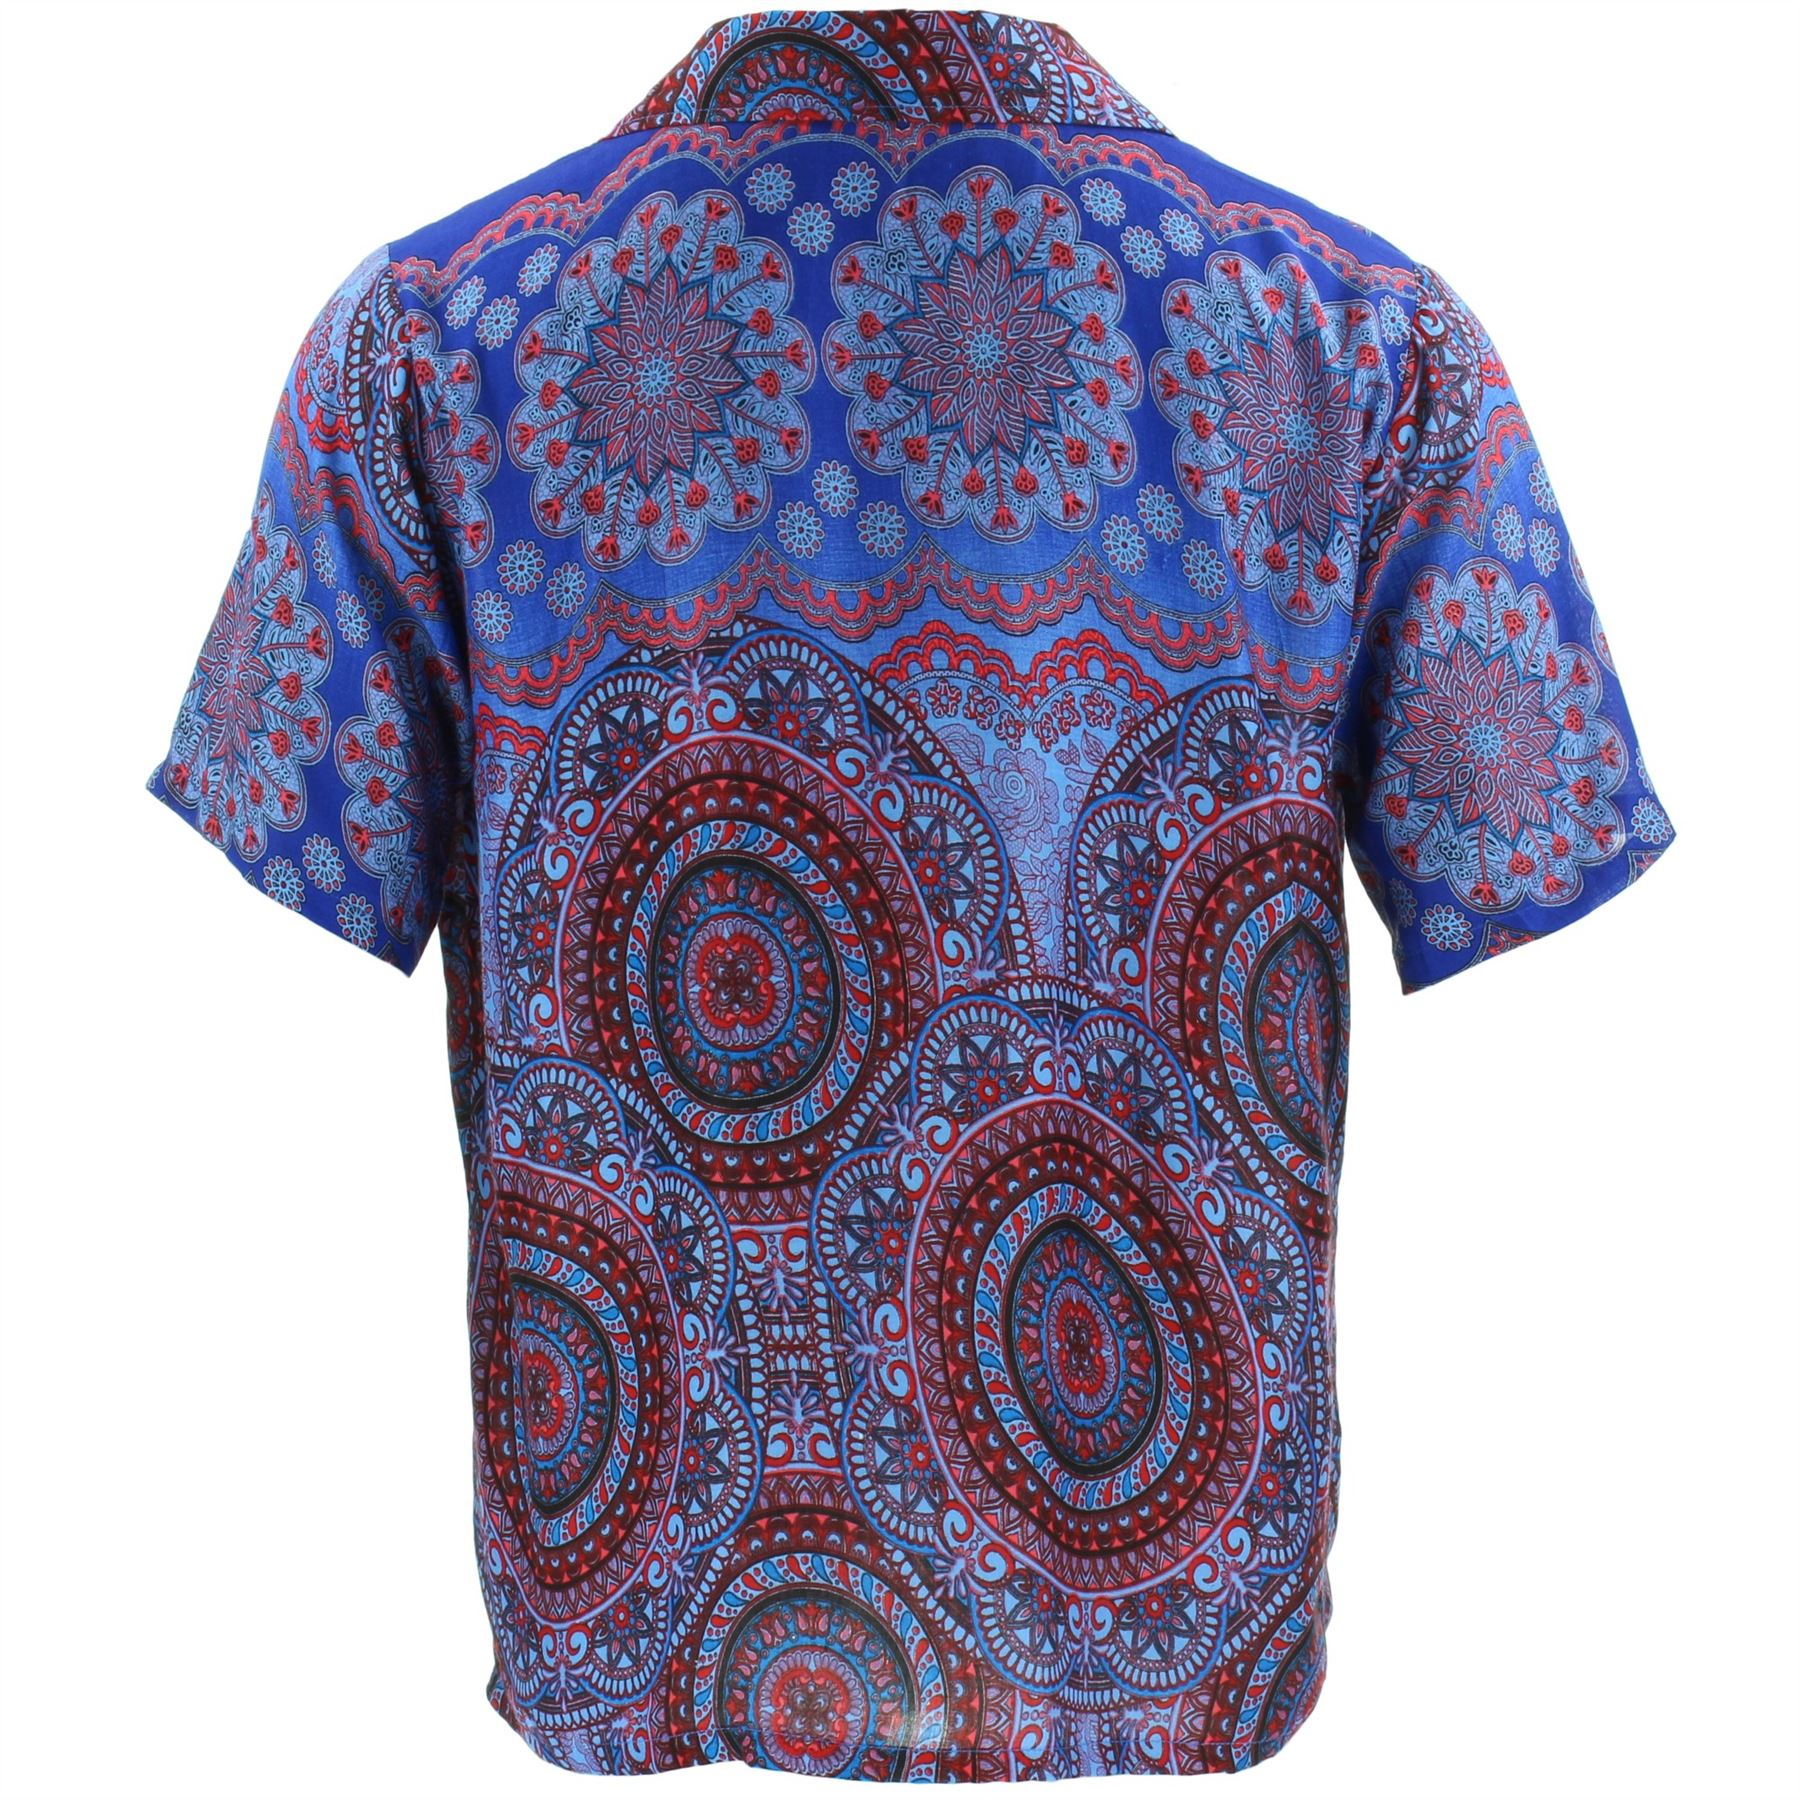 Shirt Mens Short Sleeve Hawaiian Mandala Boho Circle Siesta Party